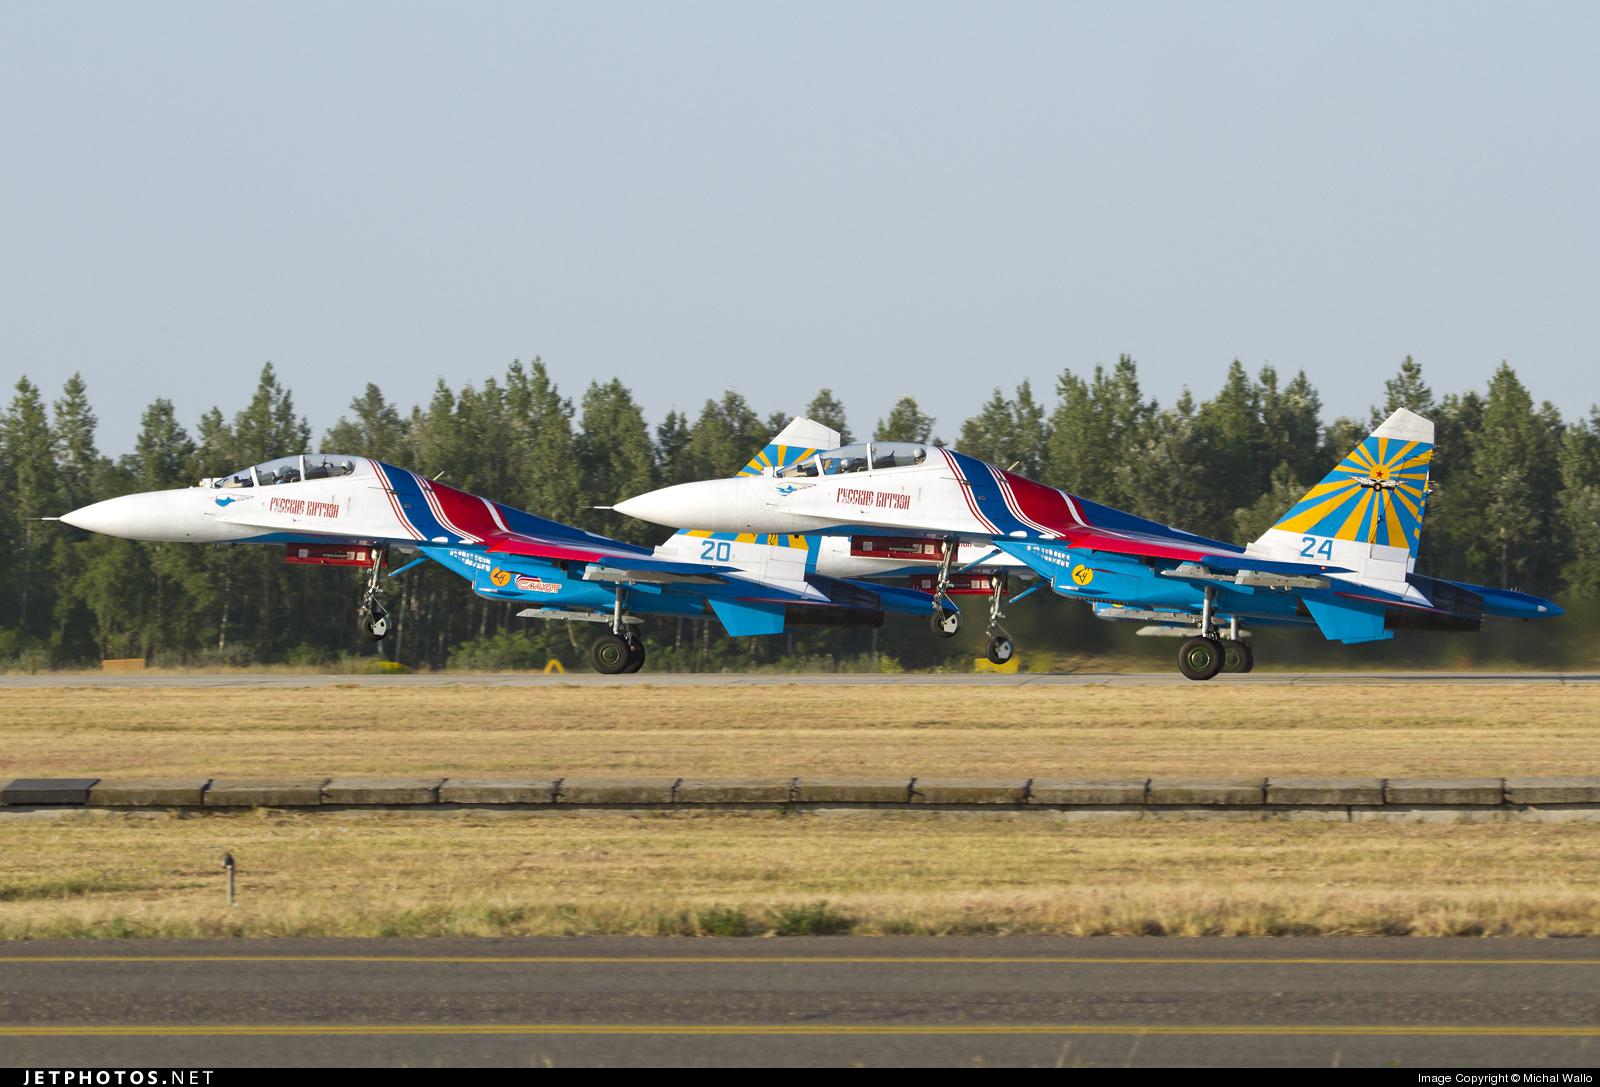 24 - Sukhoi Su-27UB Flanker C - Russia - Air Force